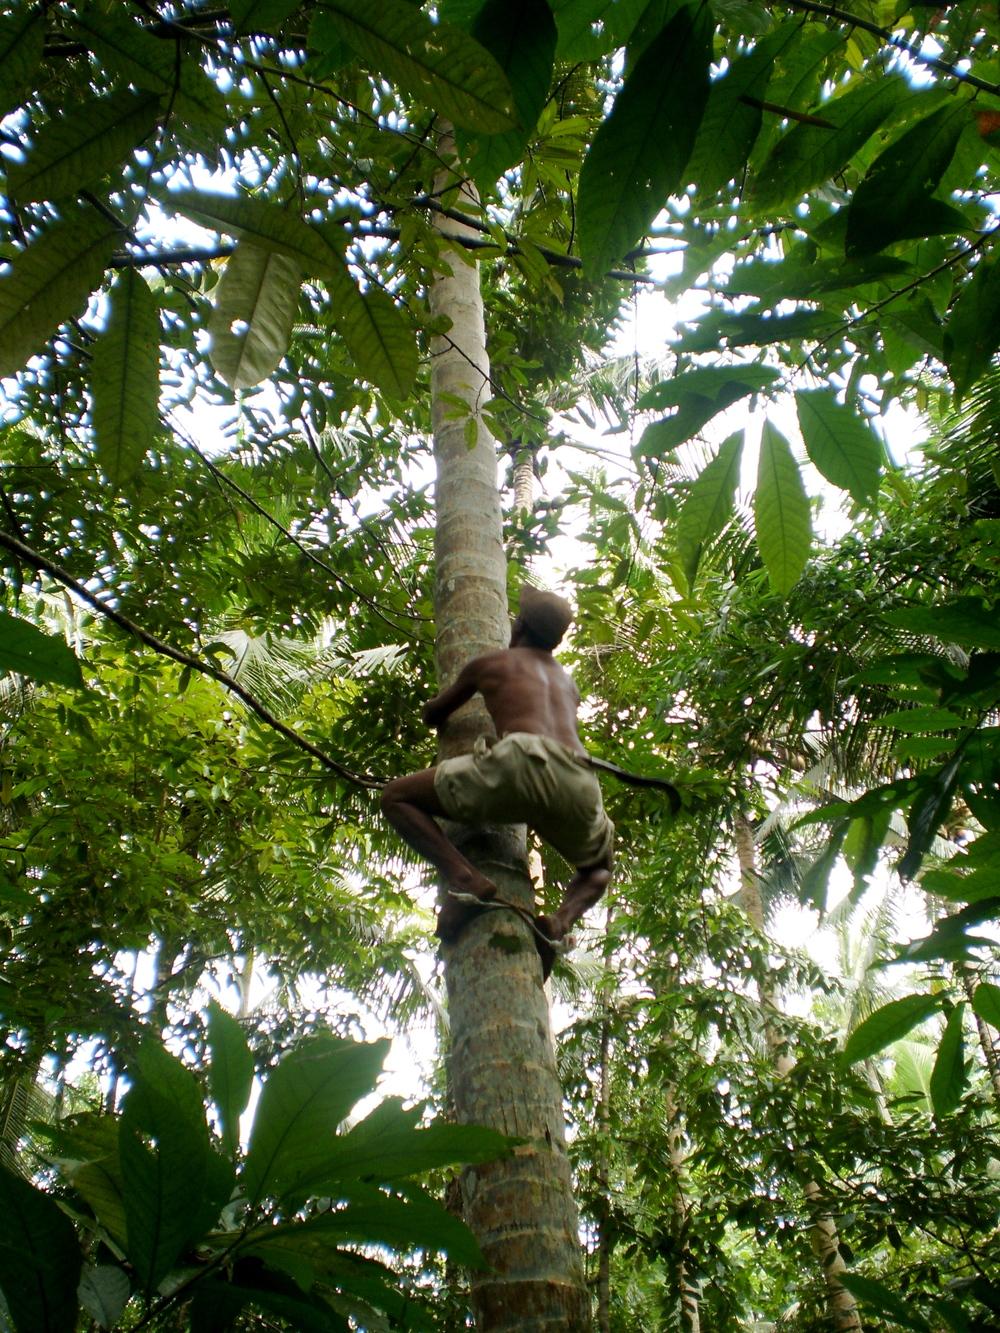 Made Sueca climbing a coconut tree